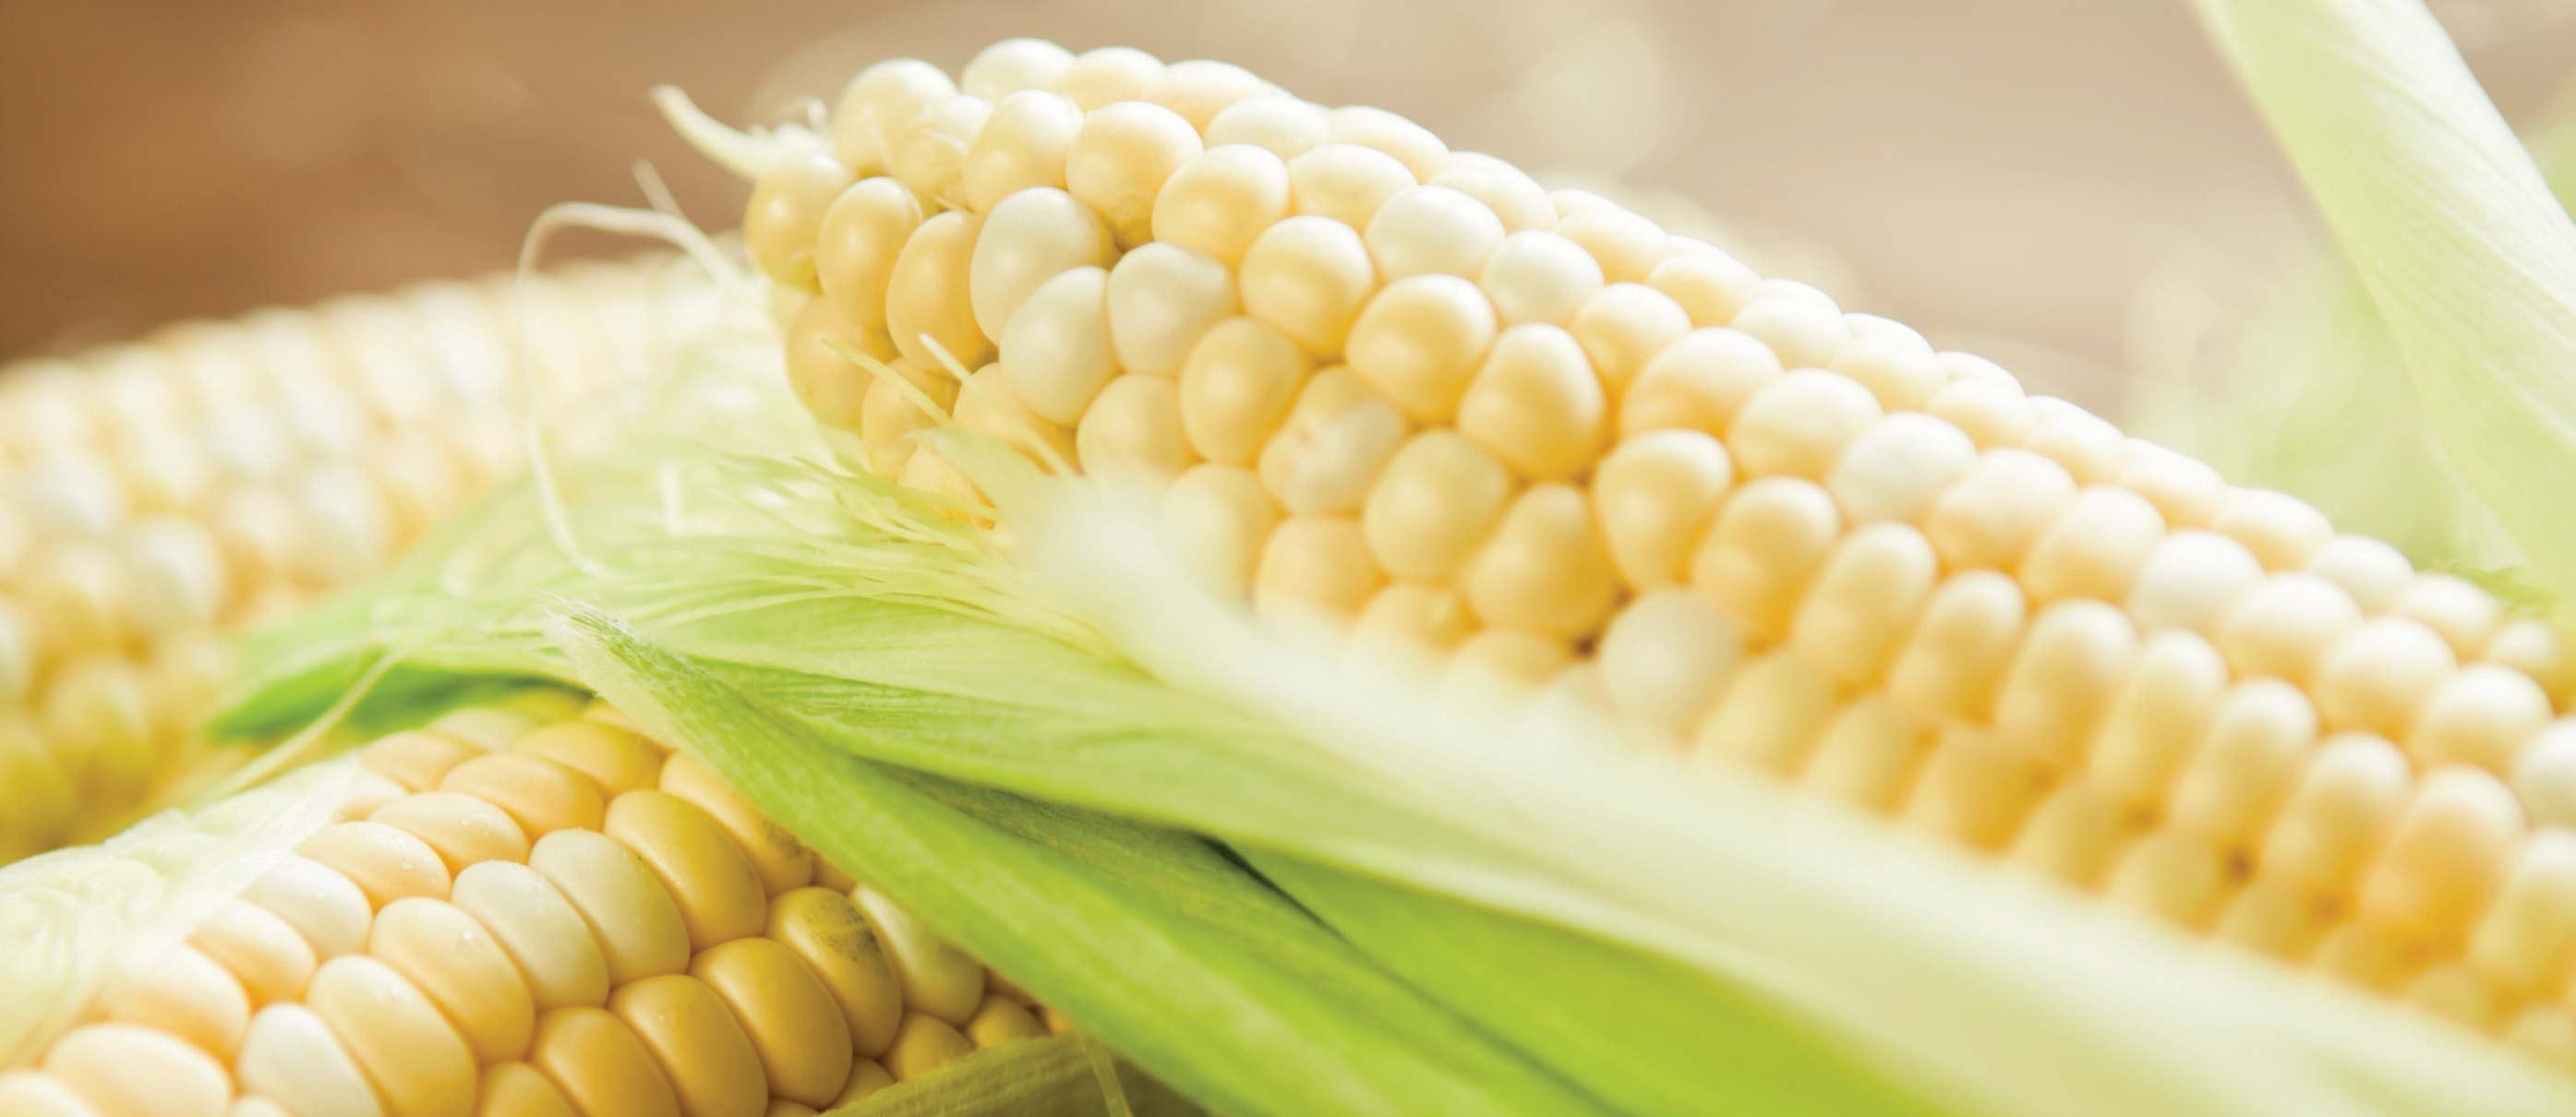 wheat corn free diet